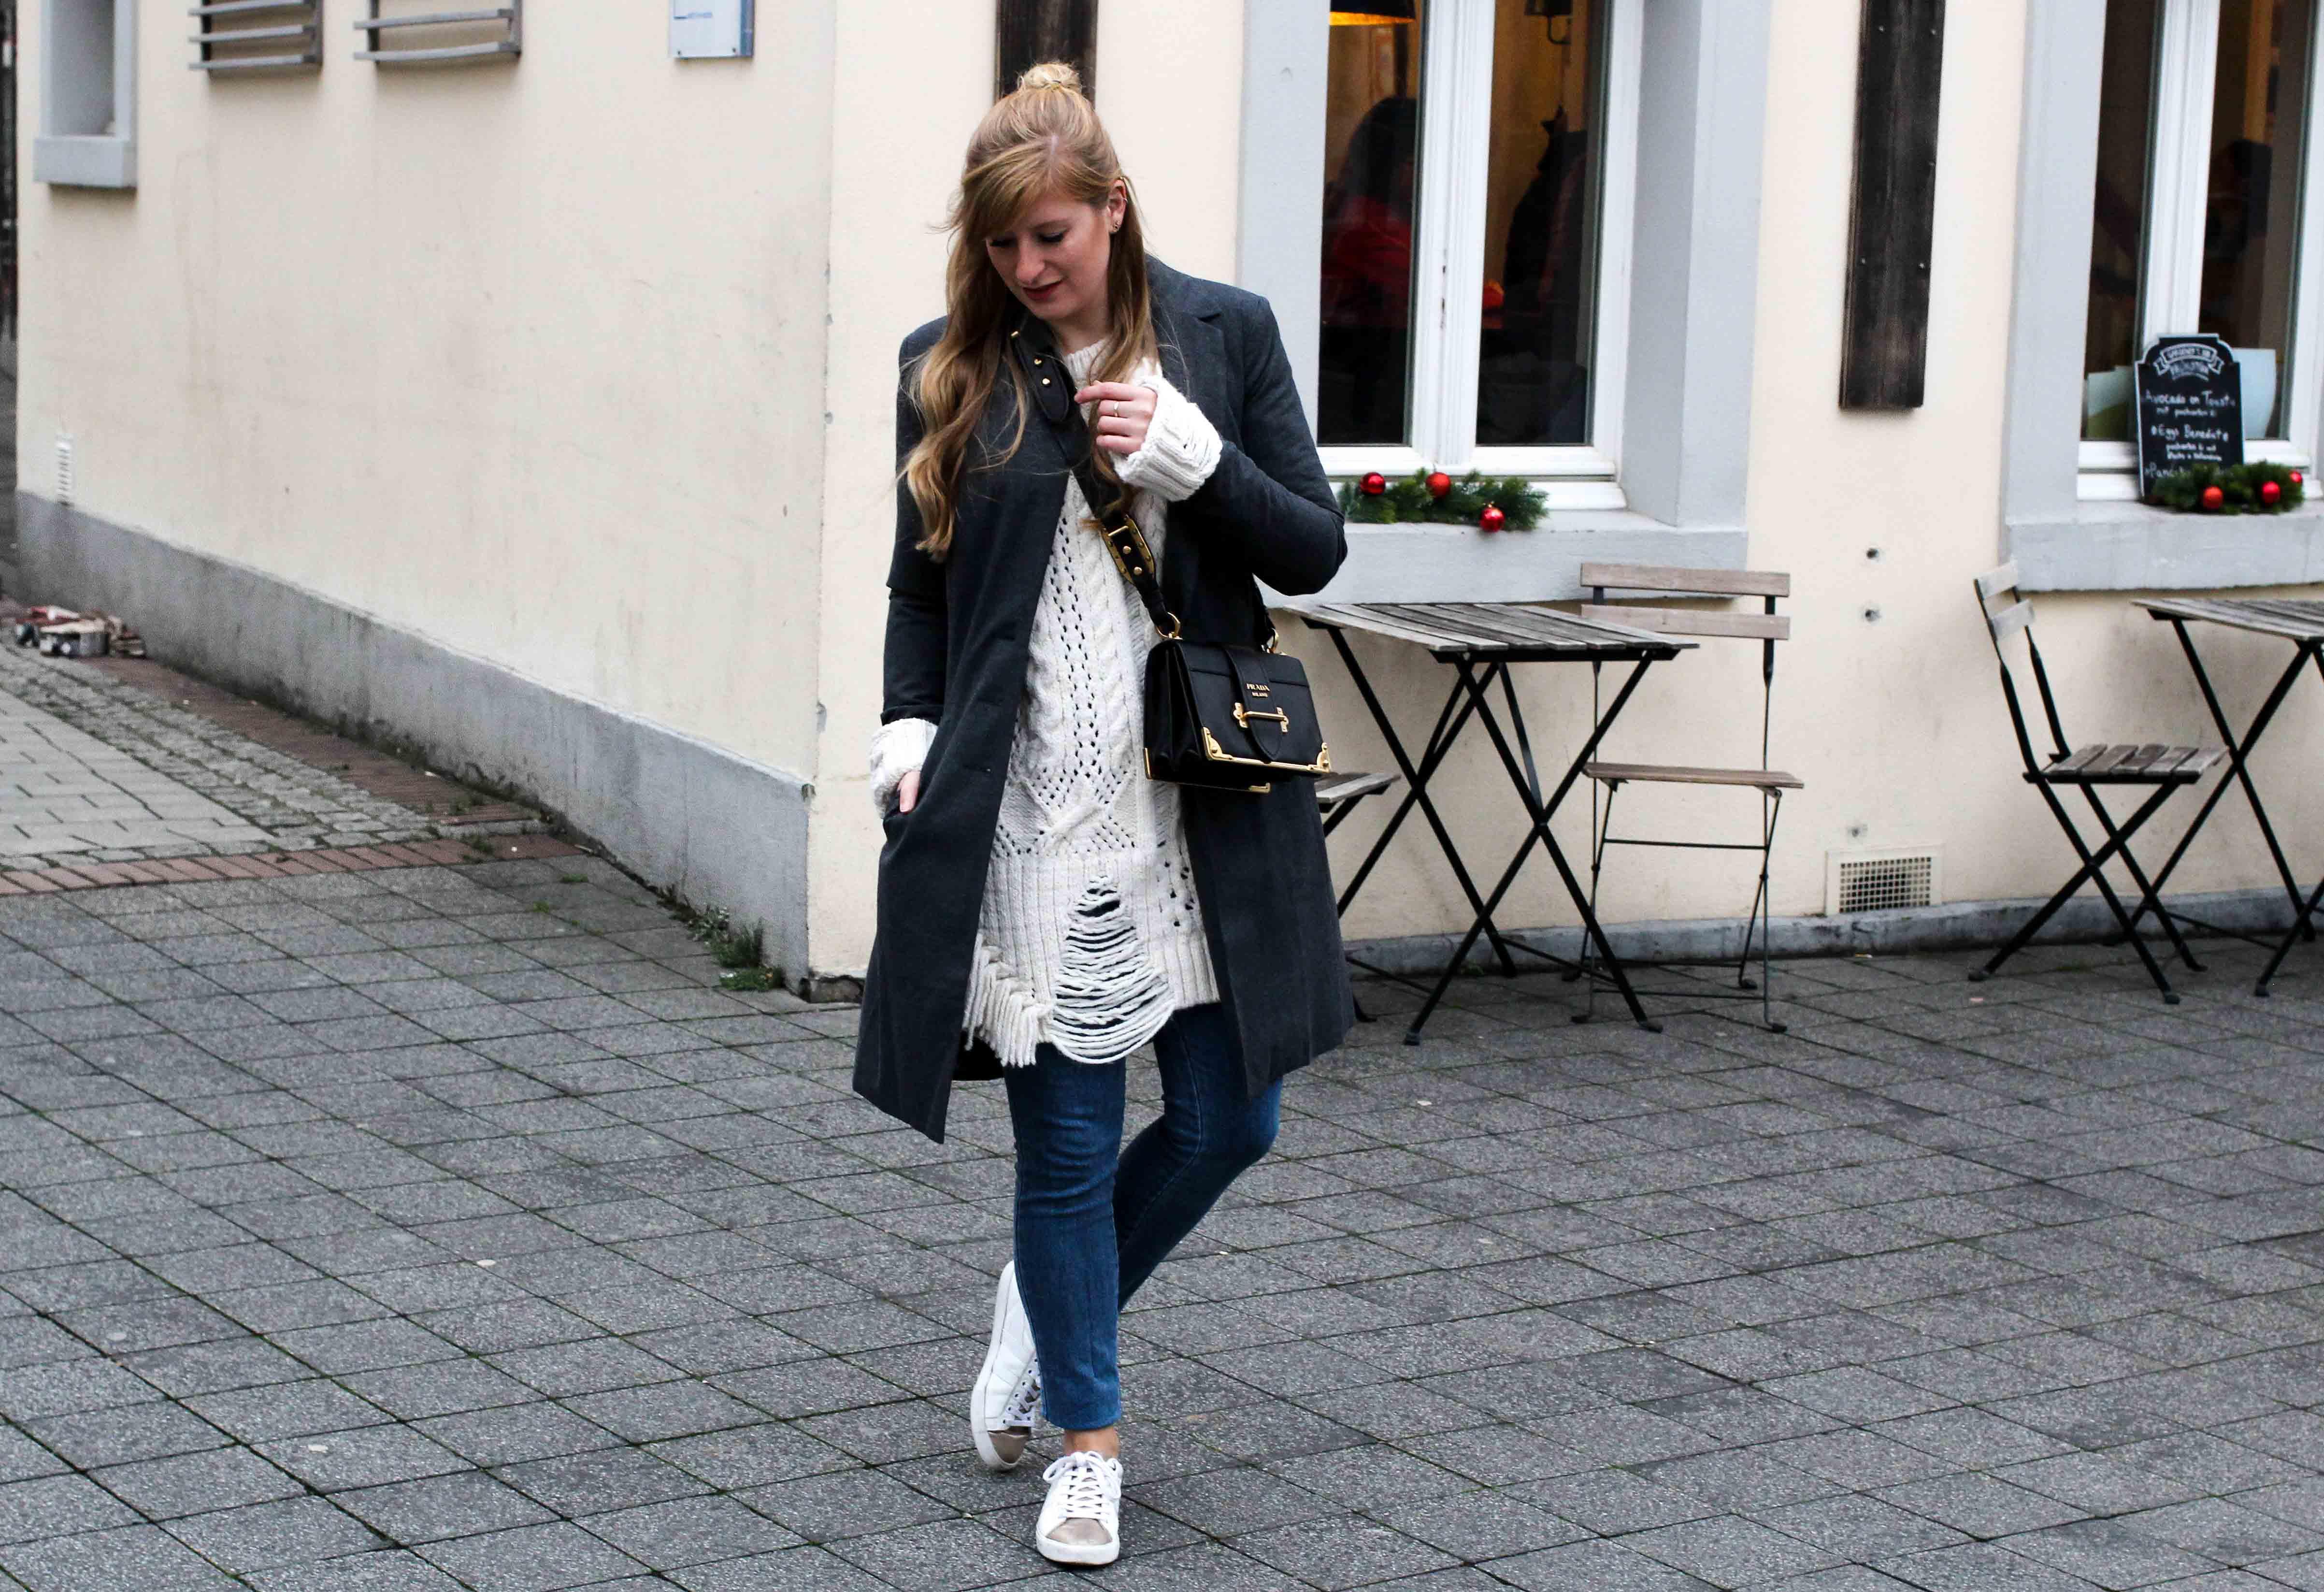 Outfit Zara Wollpullover kombinieren weiße Sneaker Blue Jeans NAKD Winterlook Prada Cahier Tasche Classy Cozy Modeblog Bonn streetstyle 4